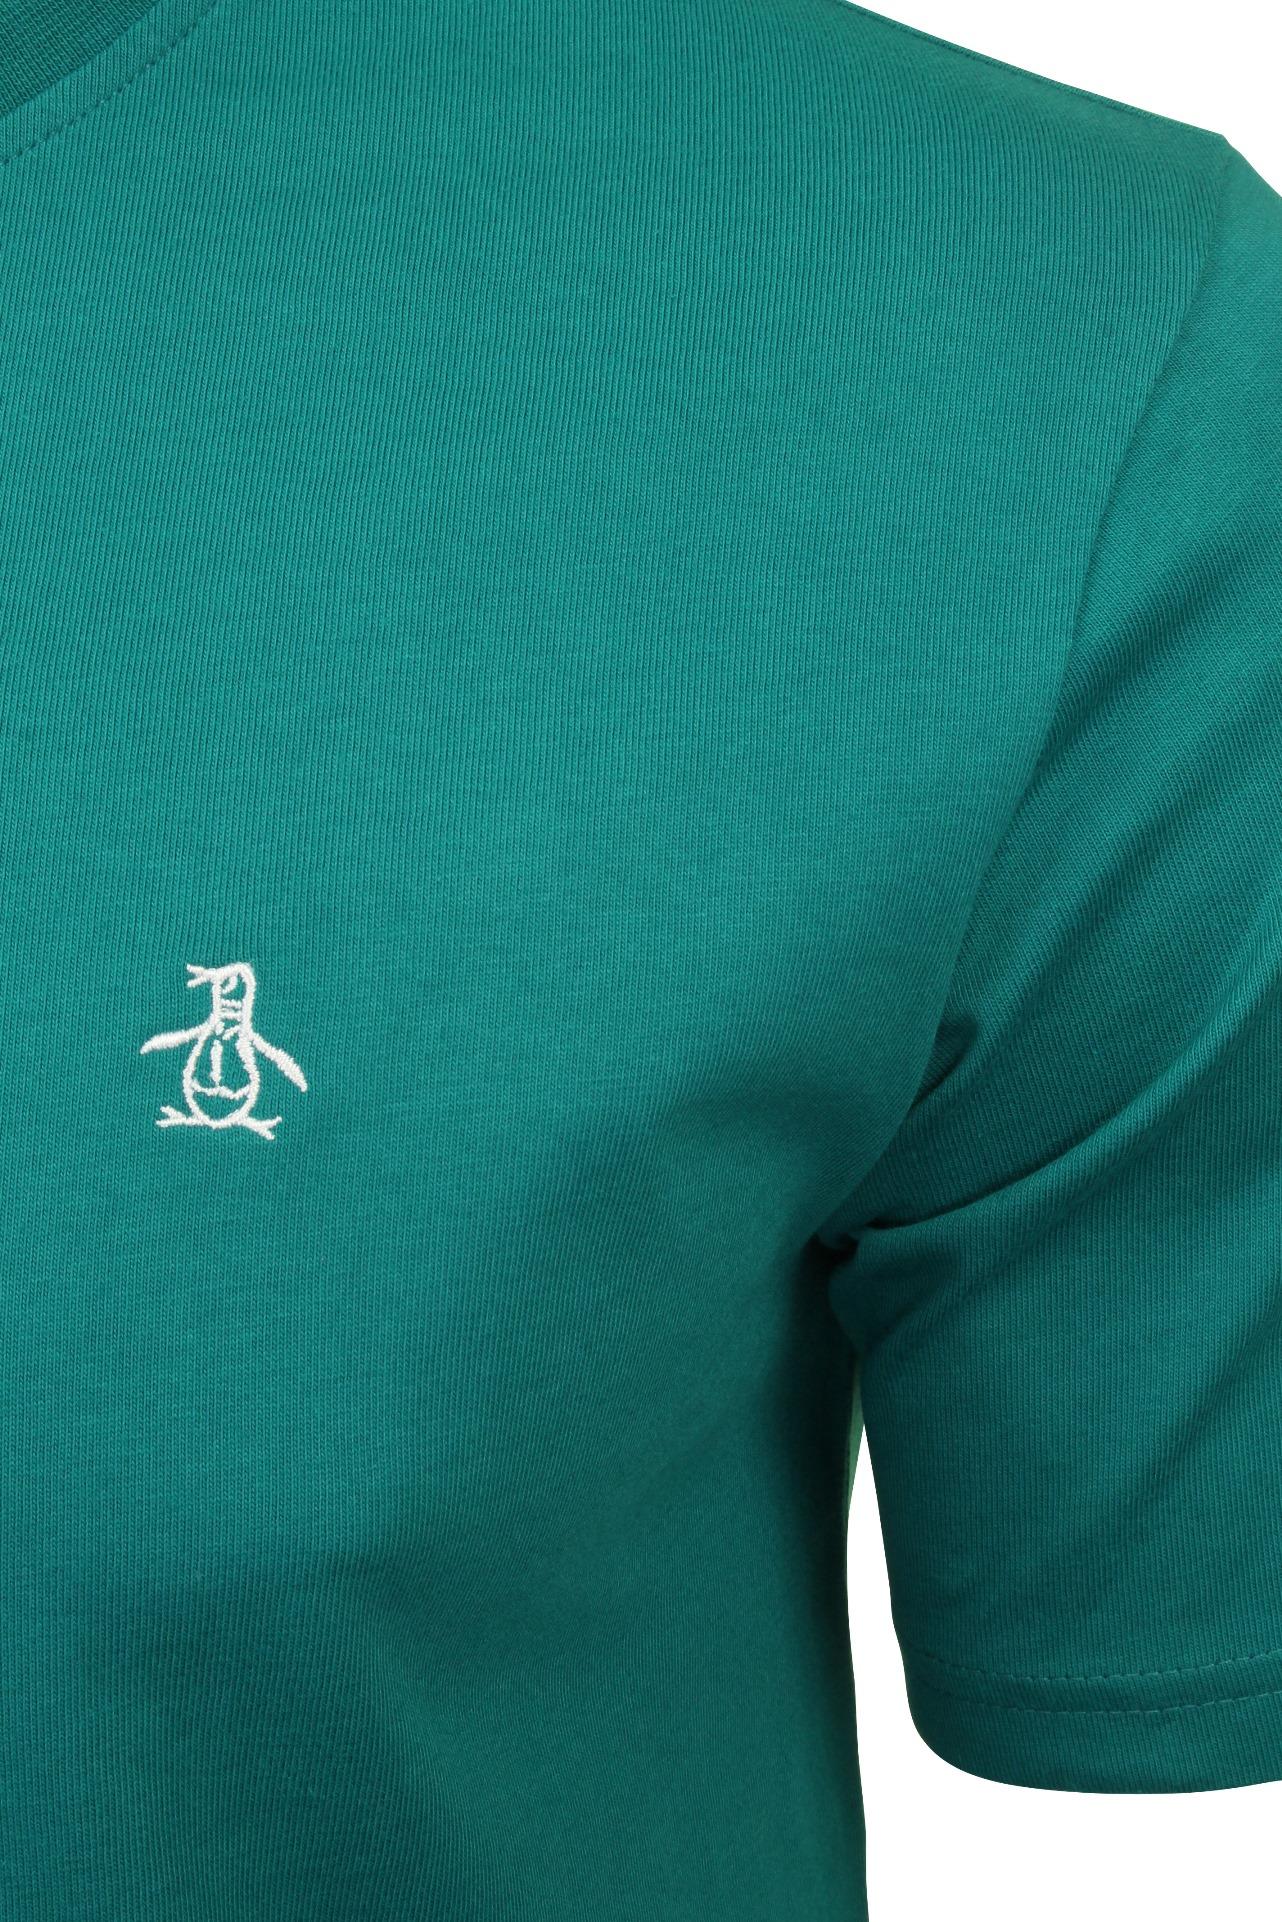 Original-Penguin-Hombre-Camiseta-de-manga-corta miniatura 25